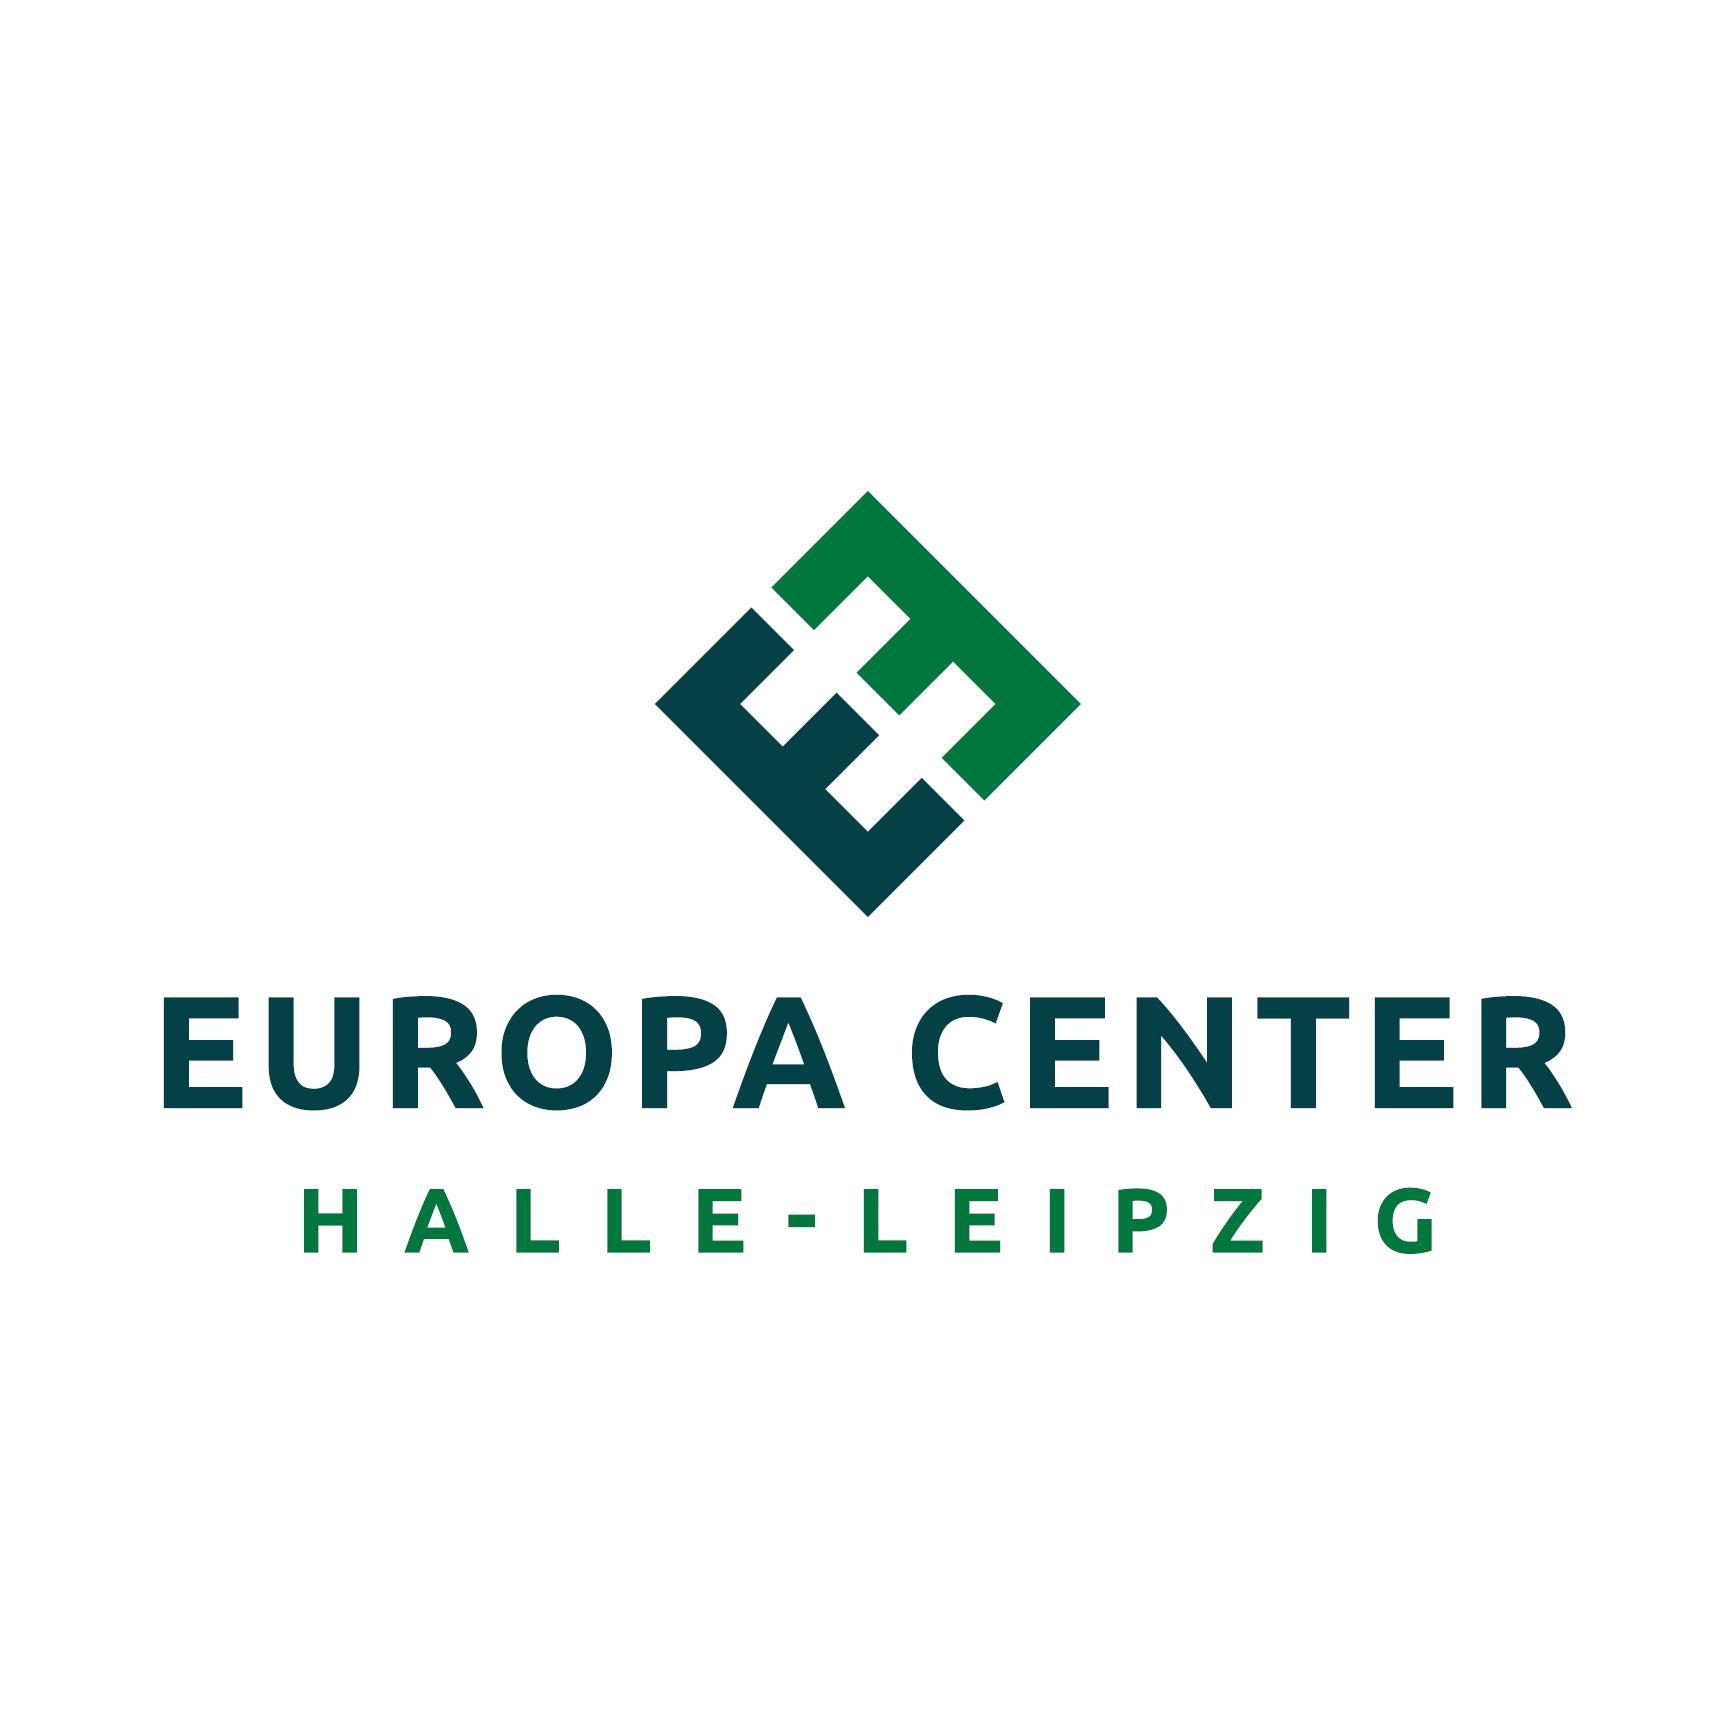 Europa Center Halle-Leipzig